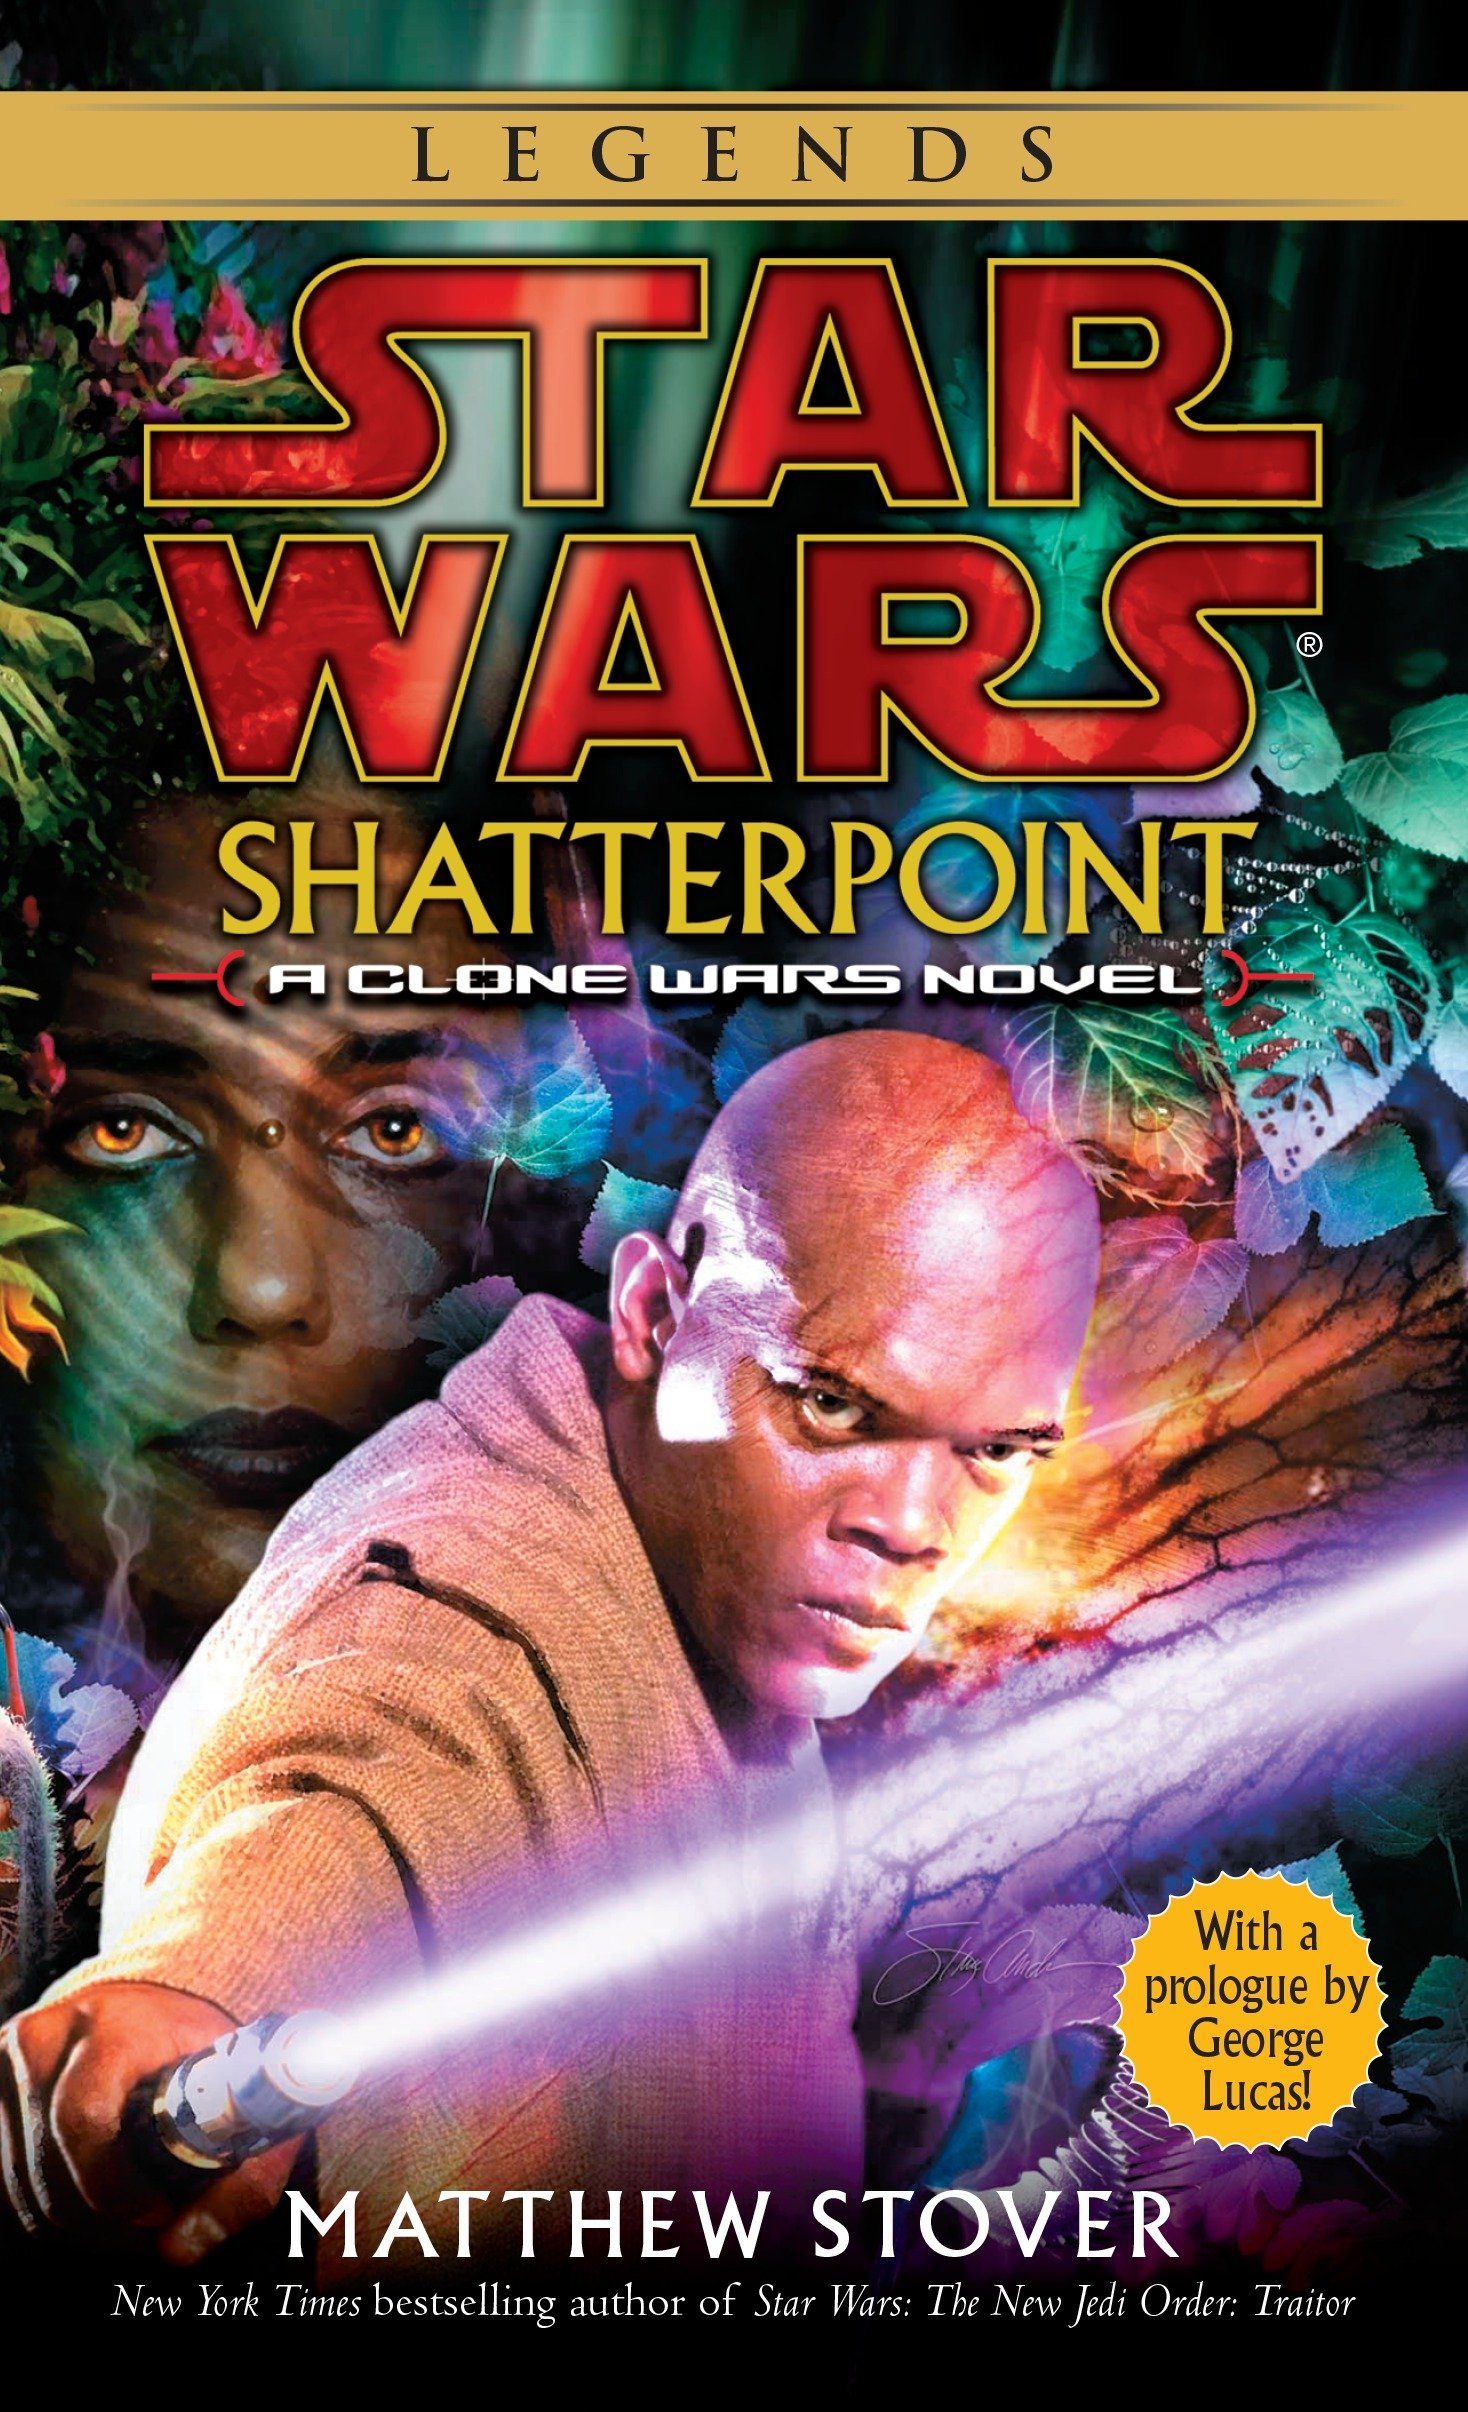 Amazon.com: Shatterpoint (Star Wars: Clone Wars) (9780345455741 ...